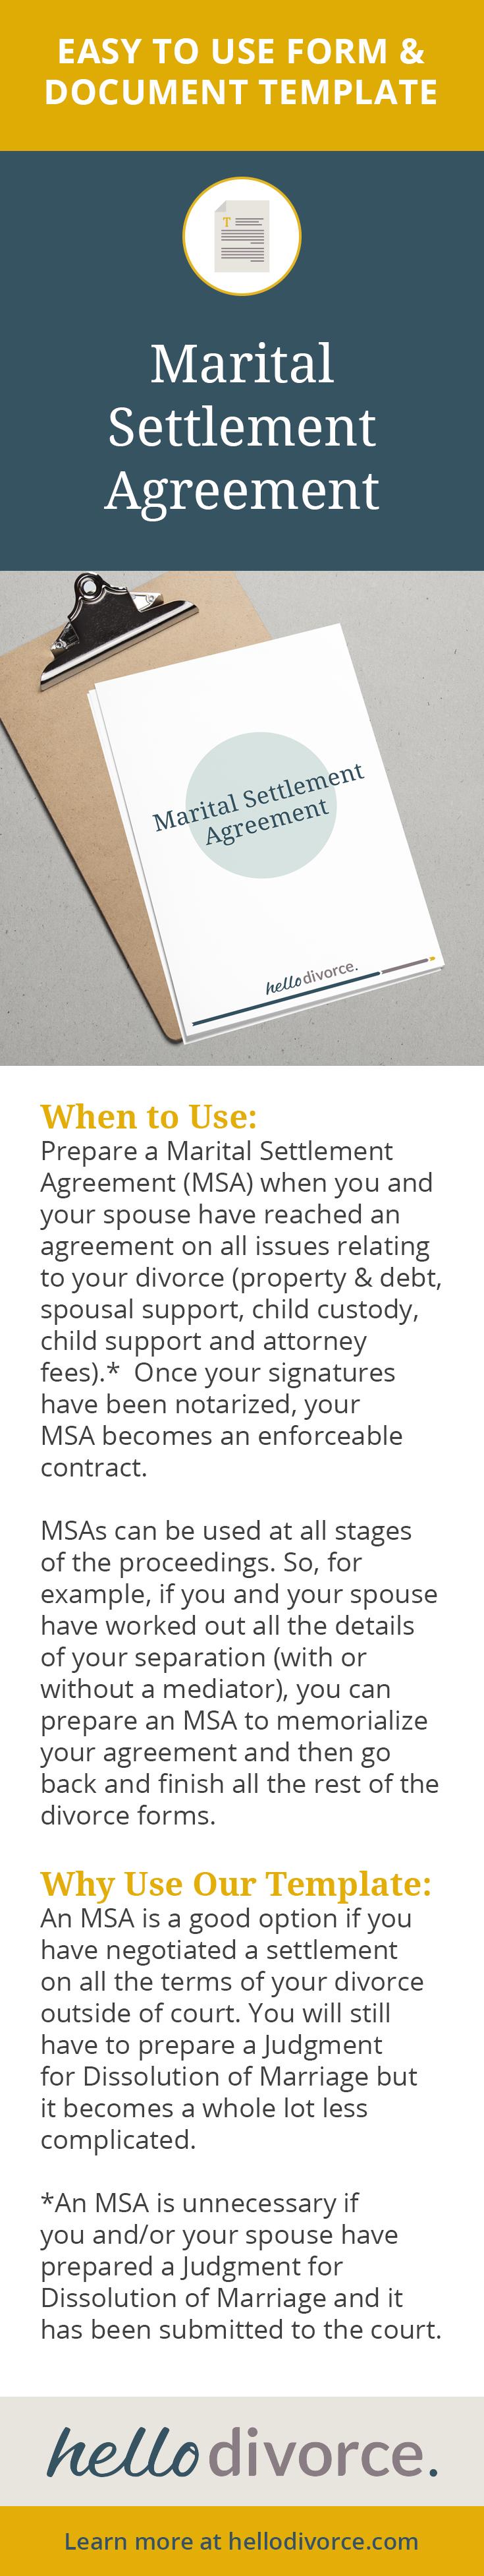 Divorce attorney diy legalhelp california your hello divorce divorce attorney diy legalhelp california solutioingenieria Gallery